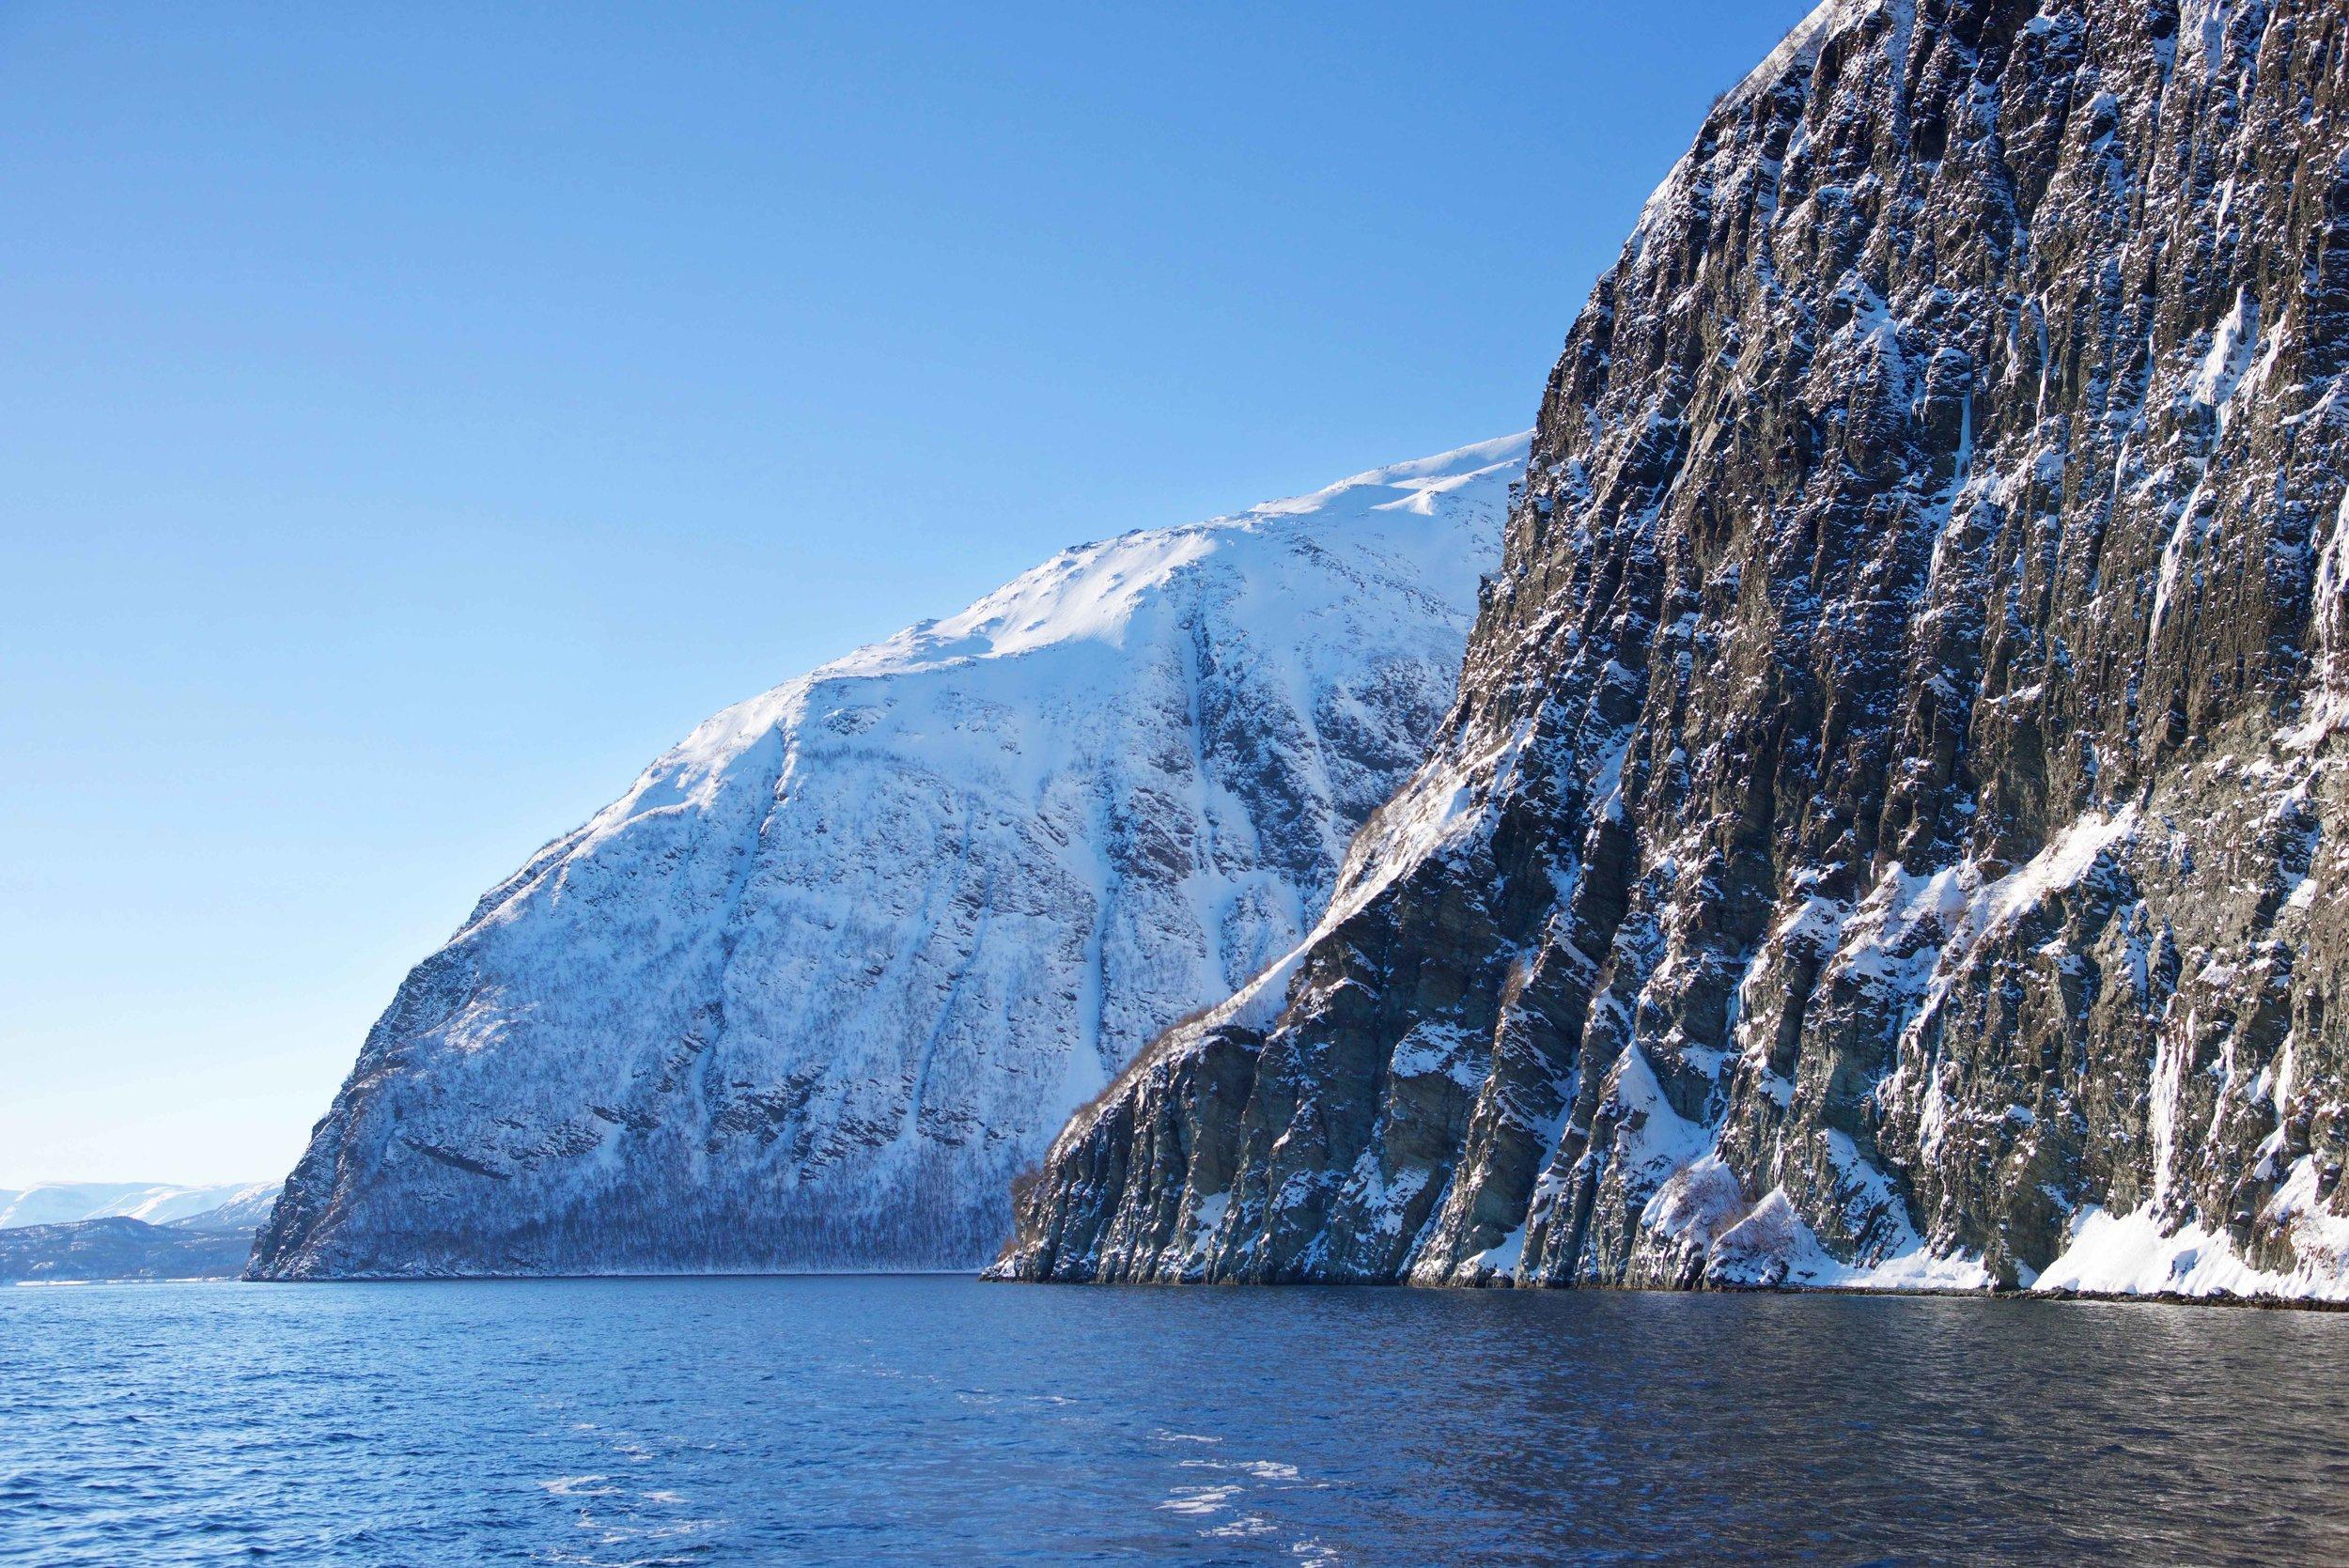 Boat cruise, Lyngen fjords, organized by Lyngen Lodge, Arctic Circle, Norway.Image©thingstodot.com